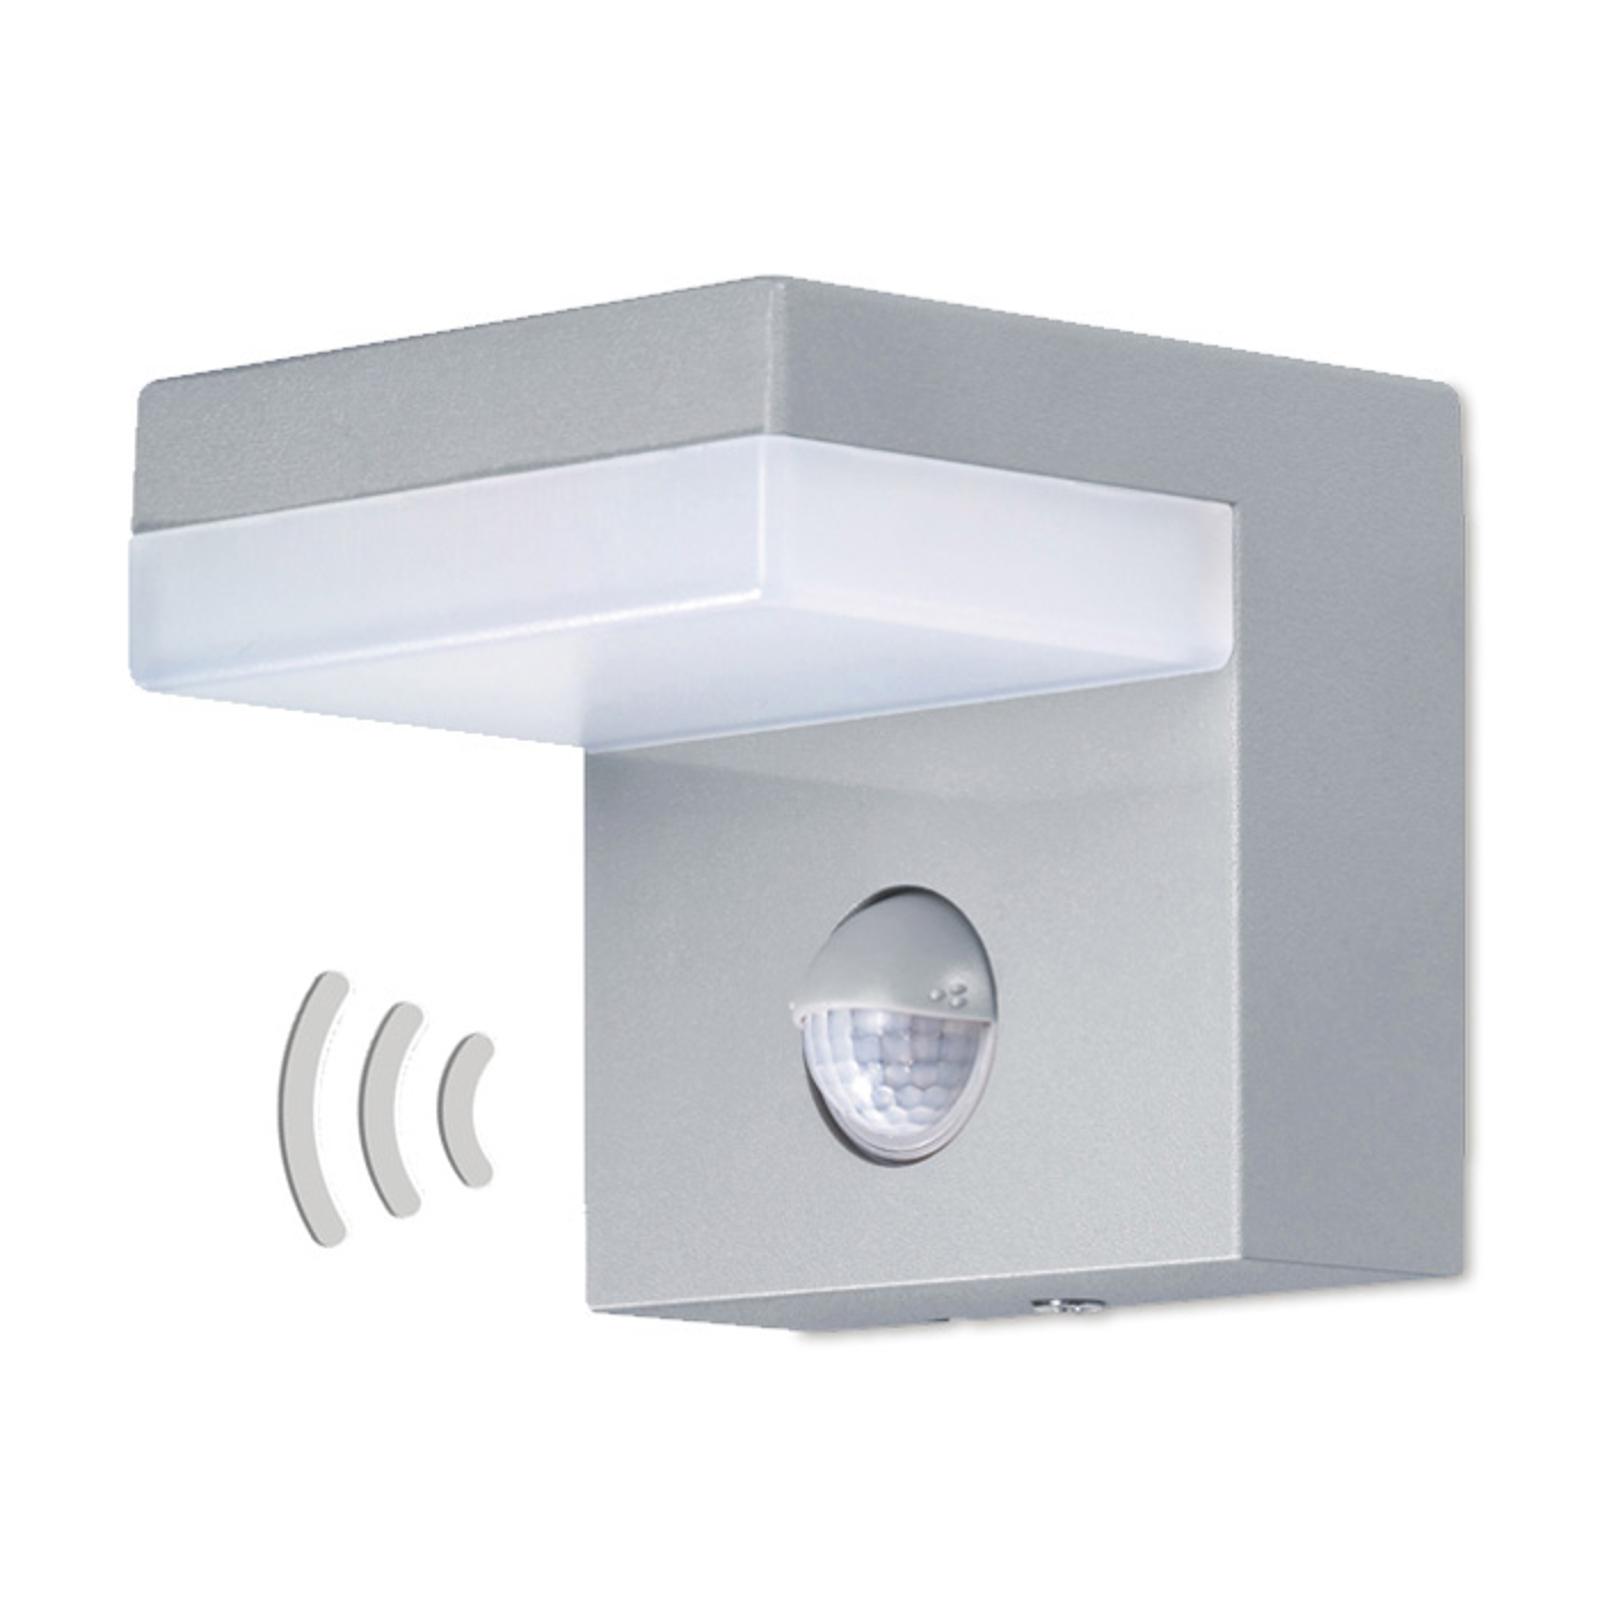 Bewegingsmelder-buitenwandlamp 800 lumen met LED